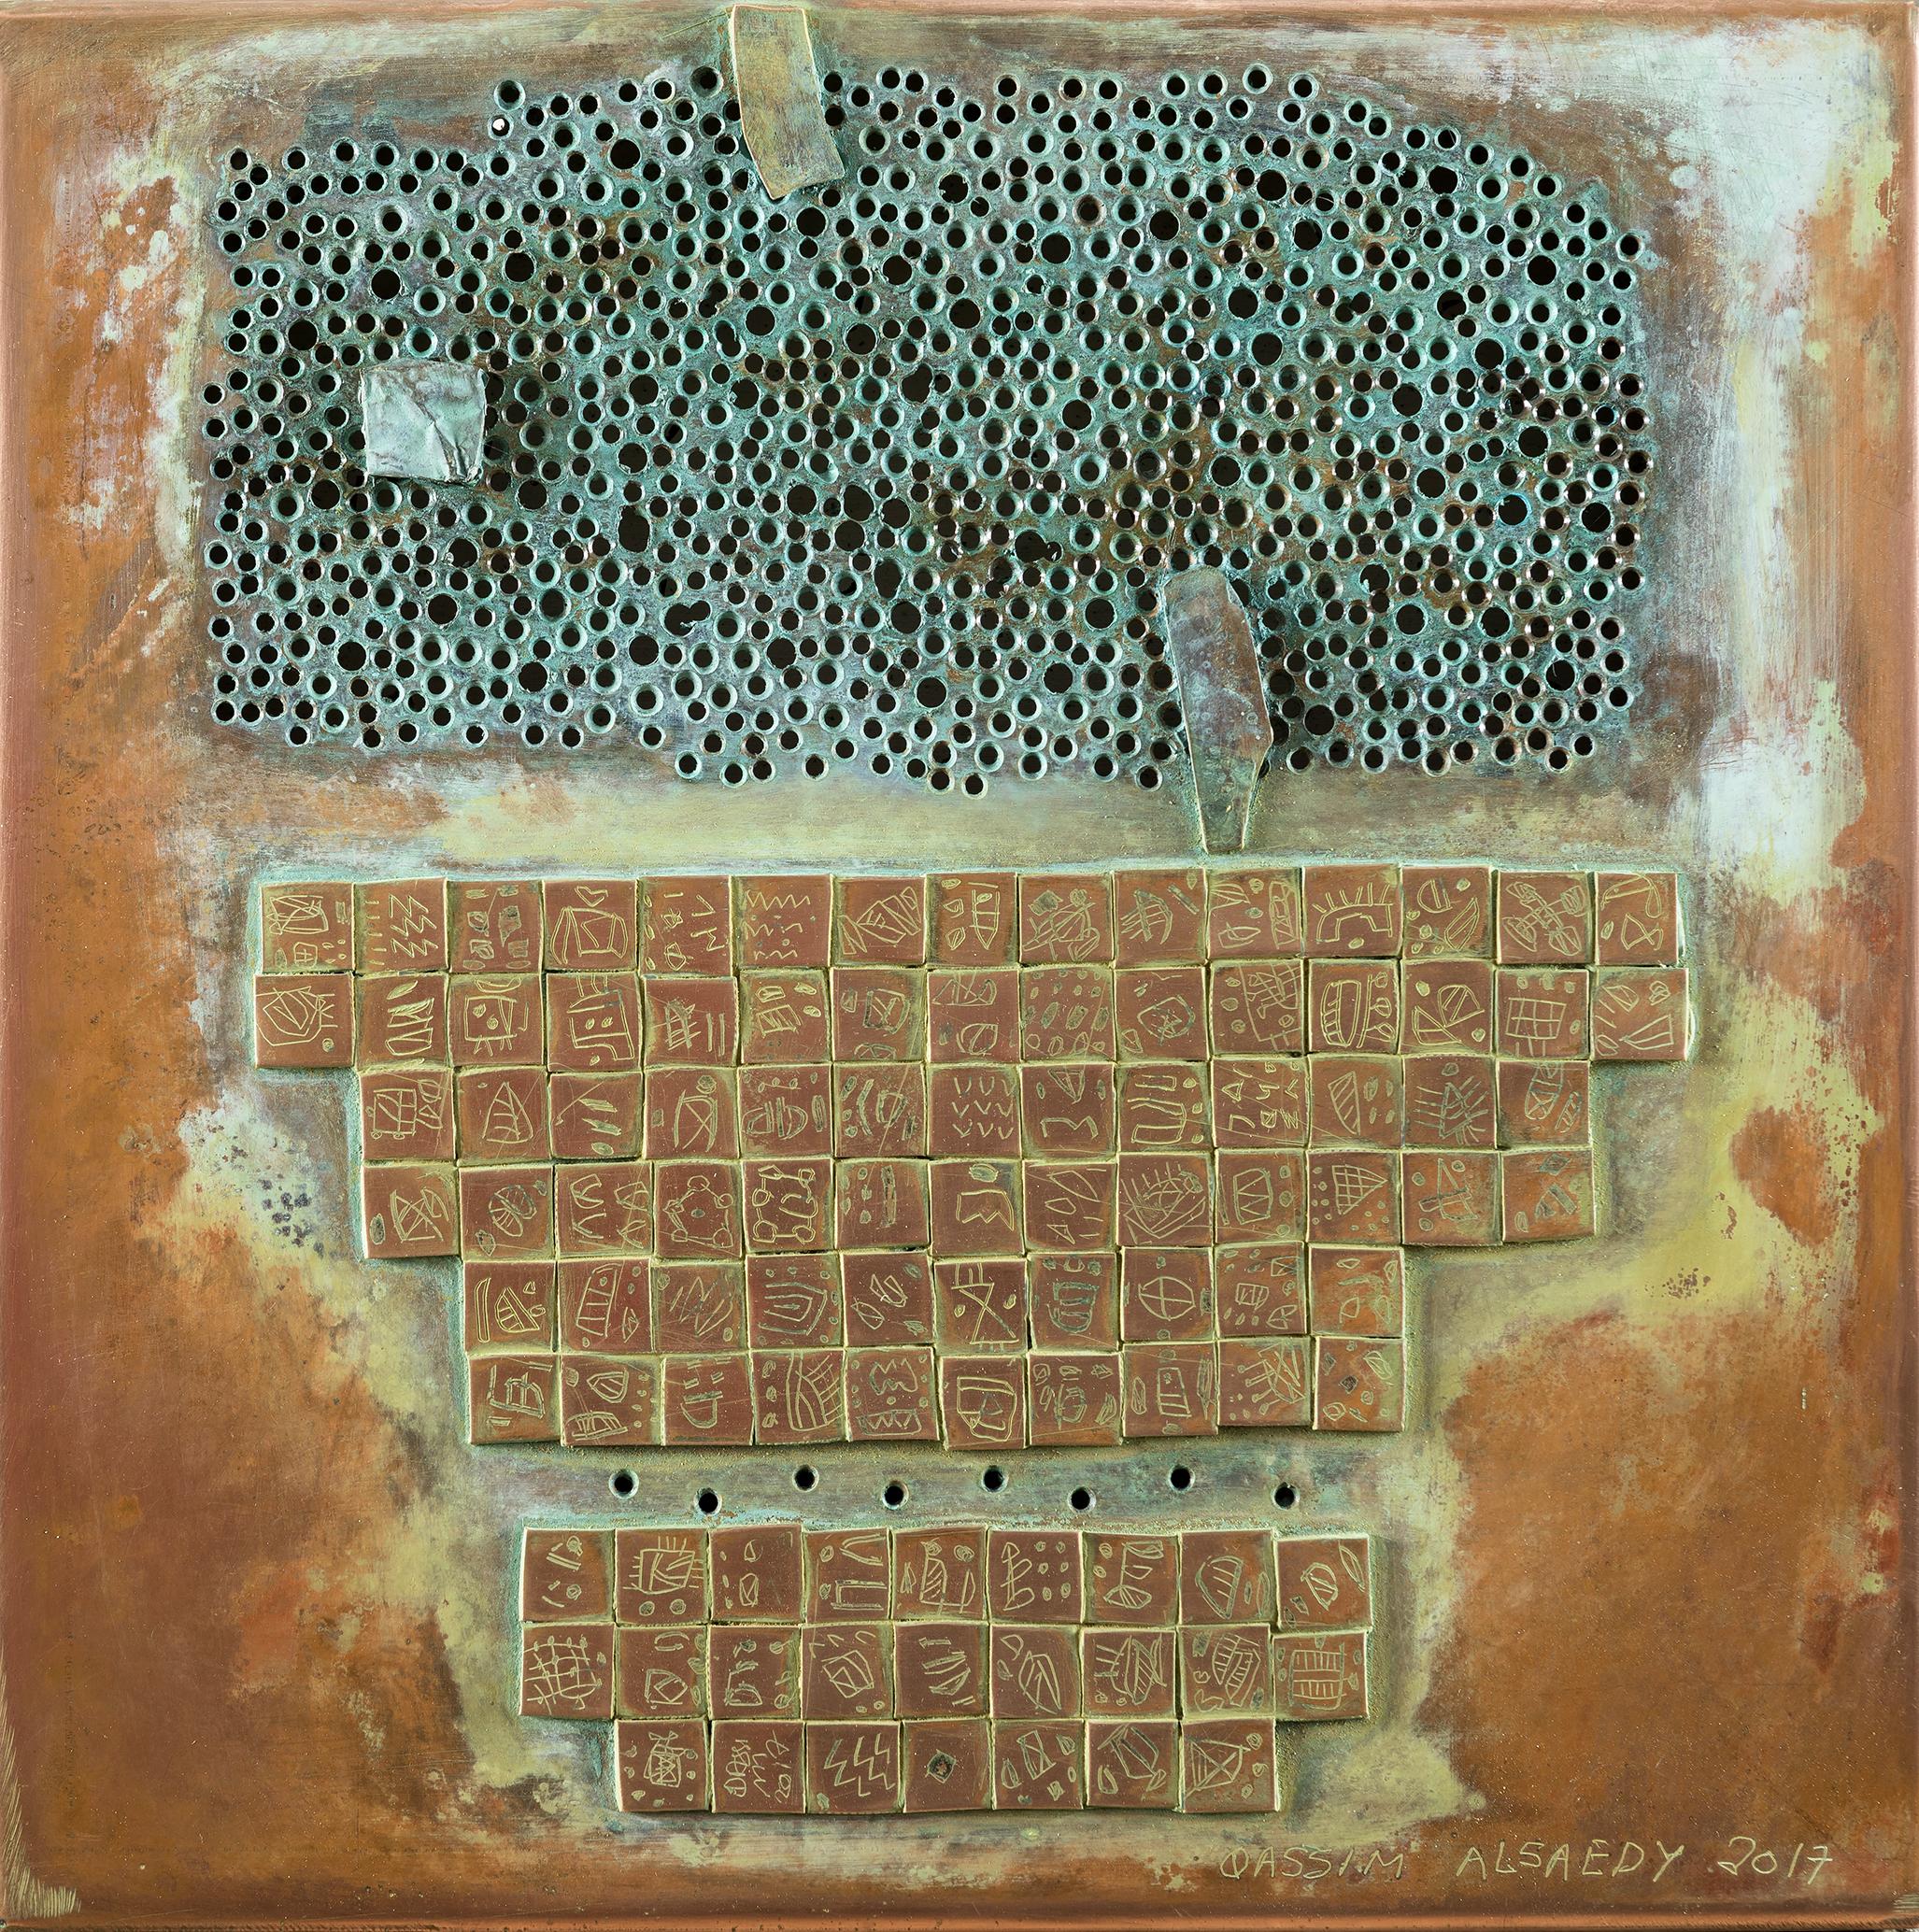 A City Portrait- Qassim Alsaedy